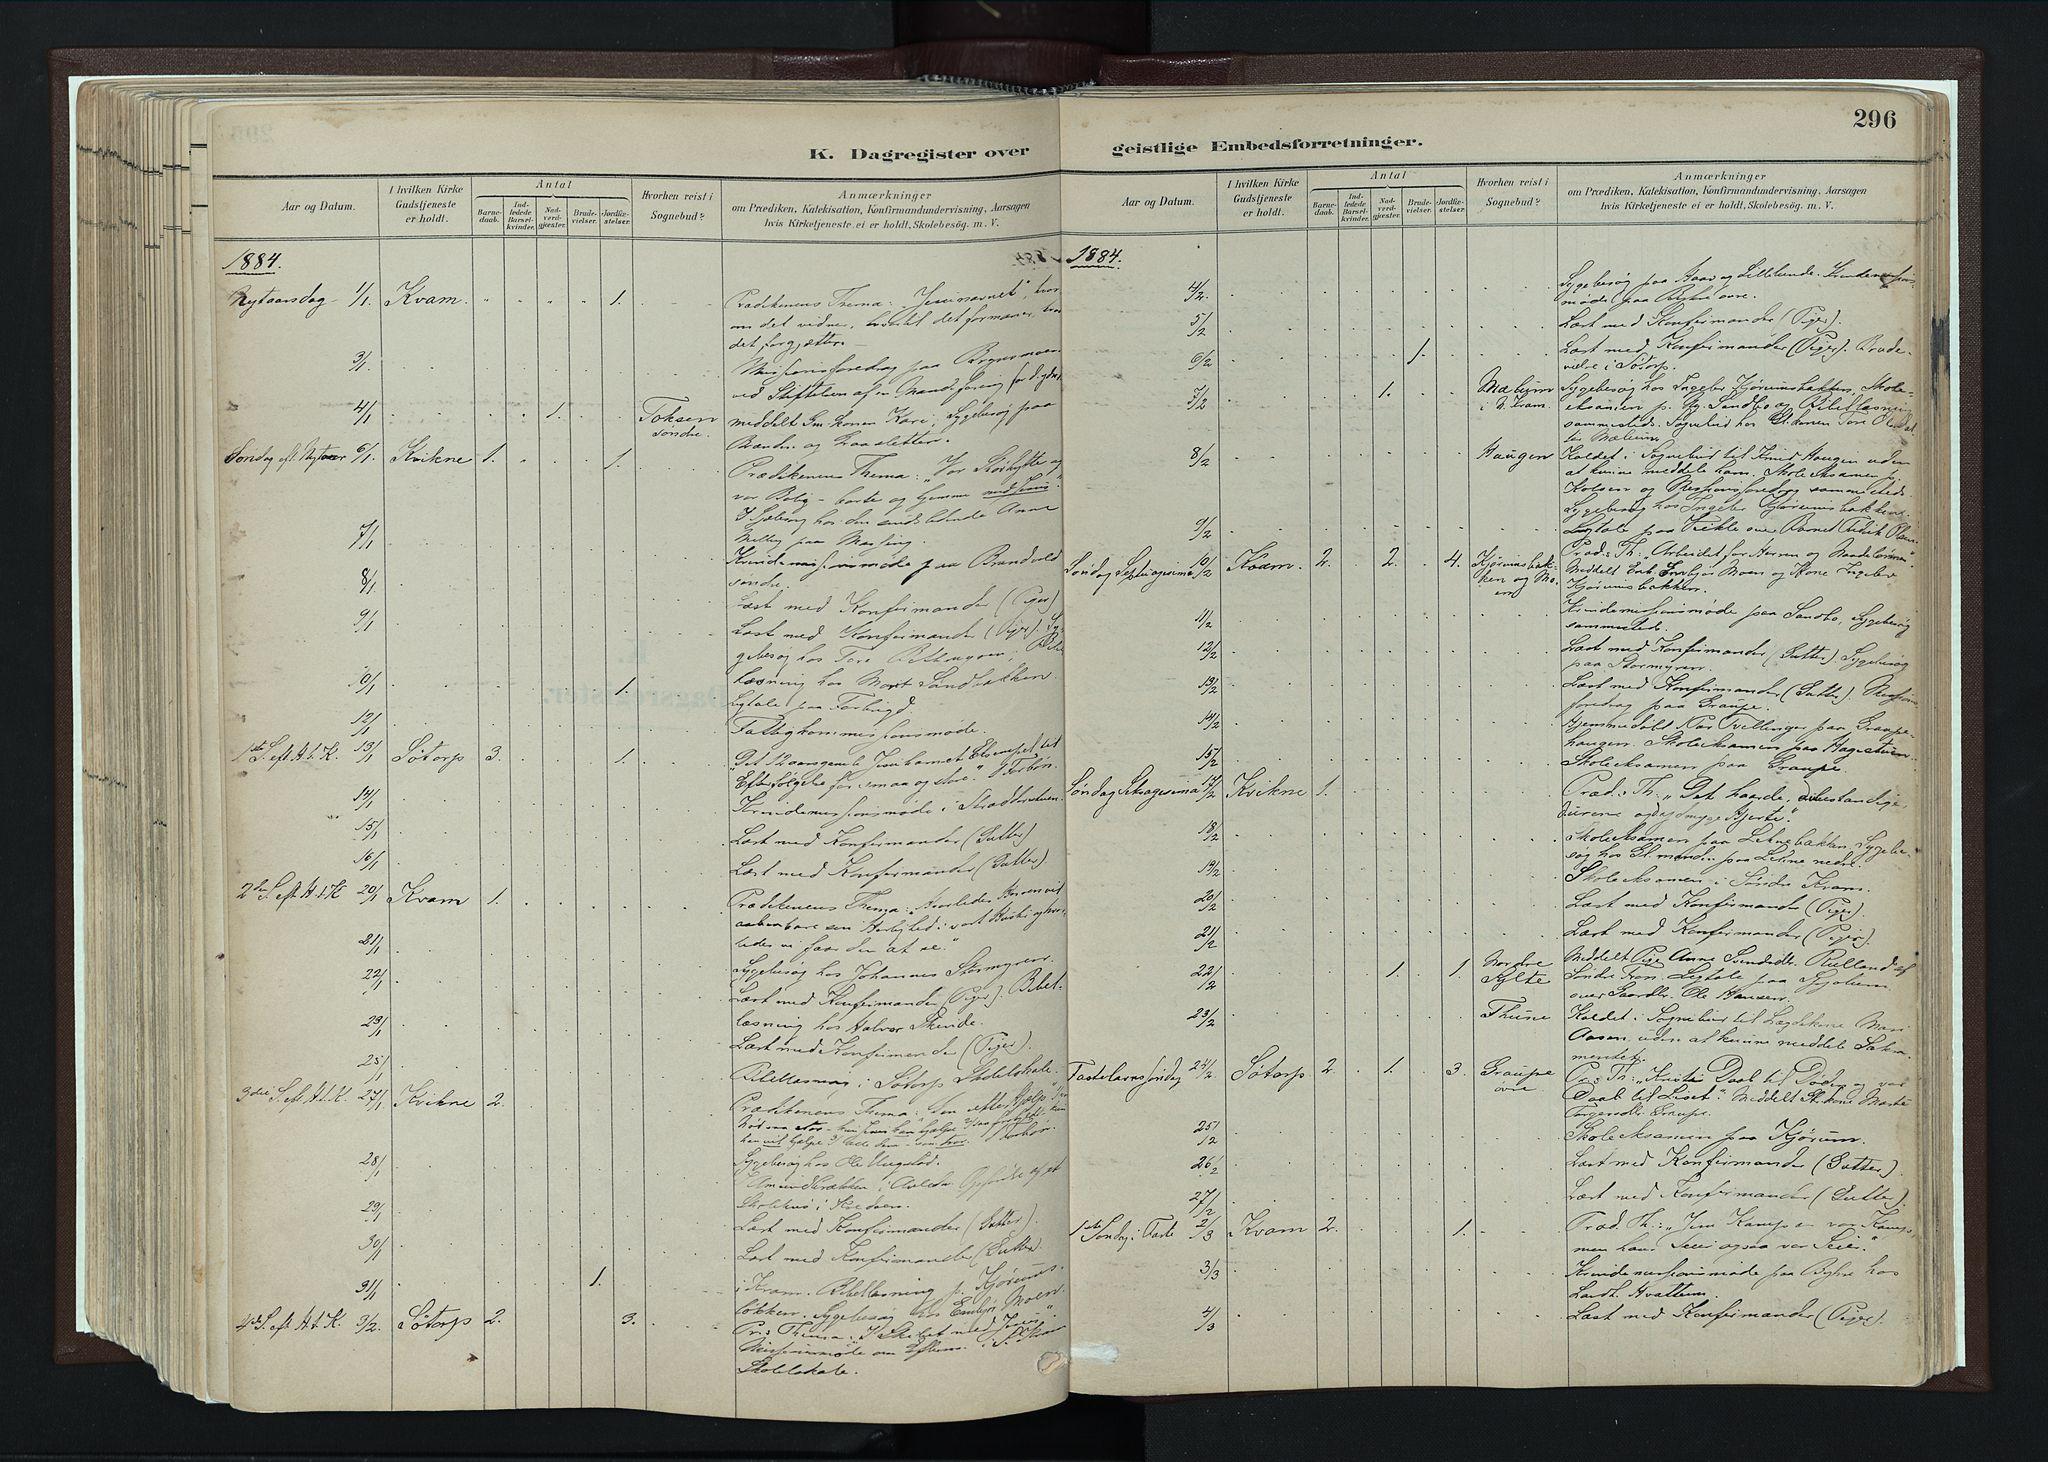 SAH, Nord-Fron prestekontor, Ministerialbok nr. 4, 1884-1914, s. 296